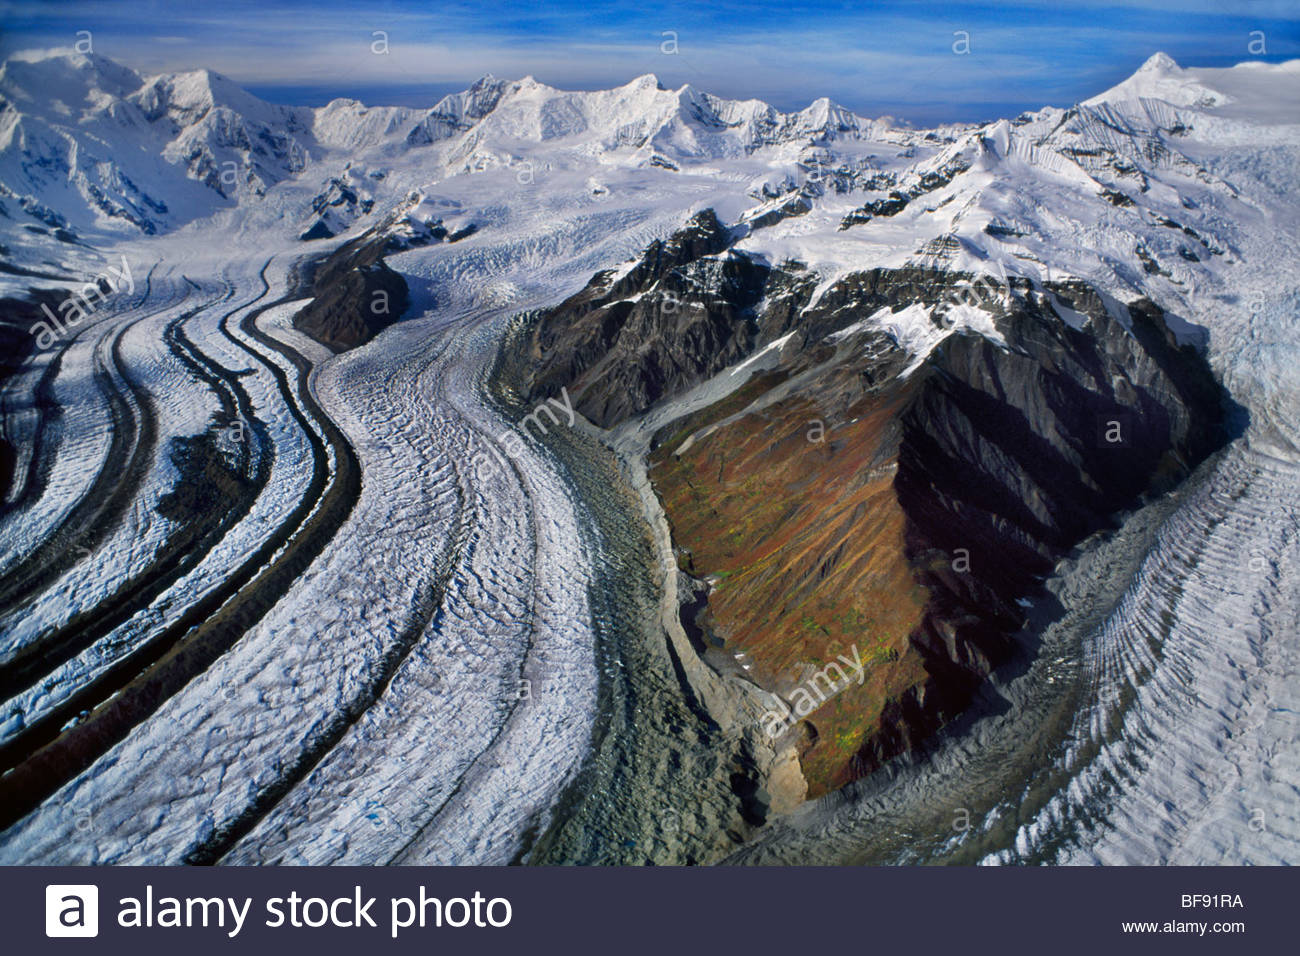 Kennicott Glacier, Mt. Blackburn (aerial), Wrangell St. Elias National Park, Alaska - Stock Image